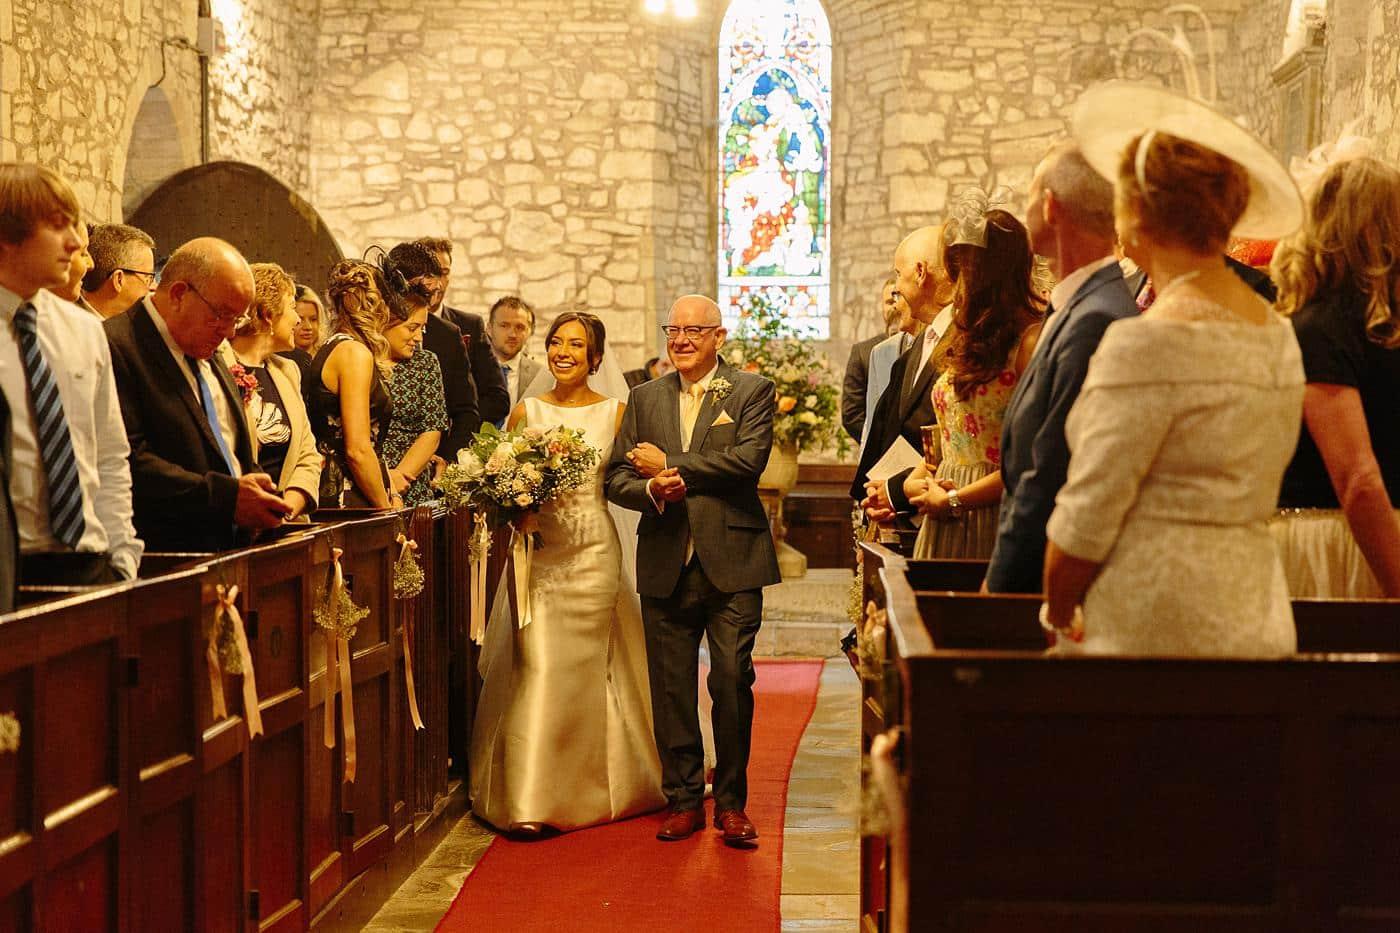 Winstanstow wedding photography 0379